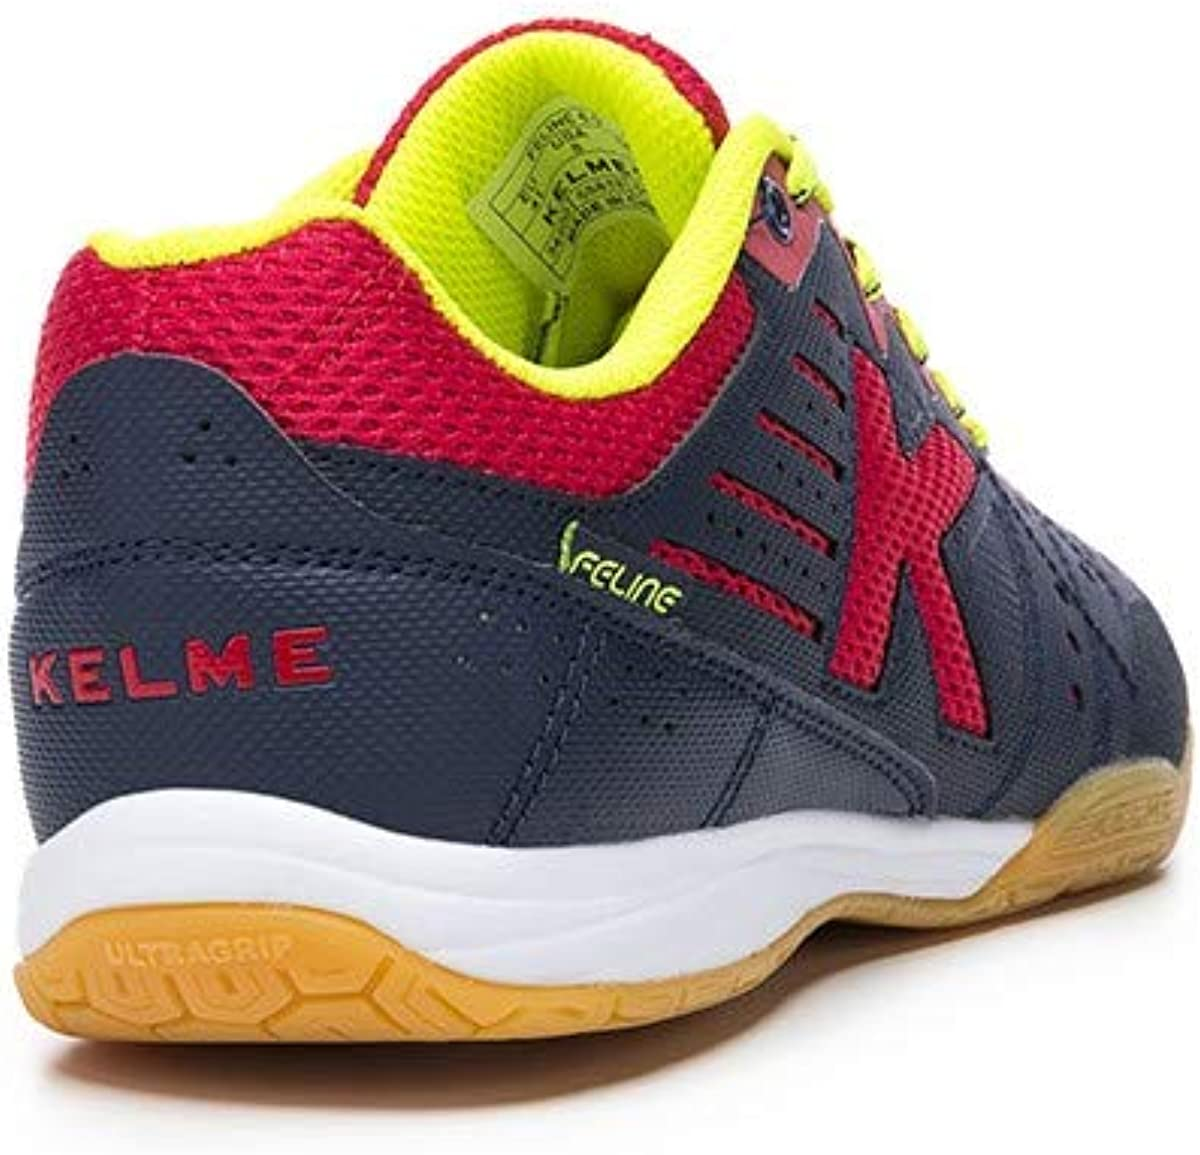 Kelme Feline 5.0 – Men's Football Shoes